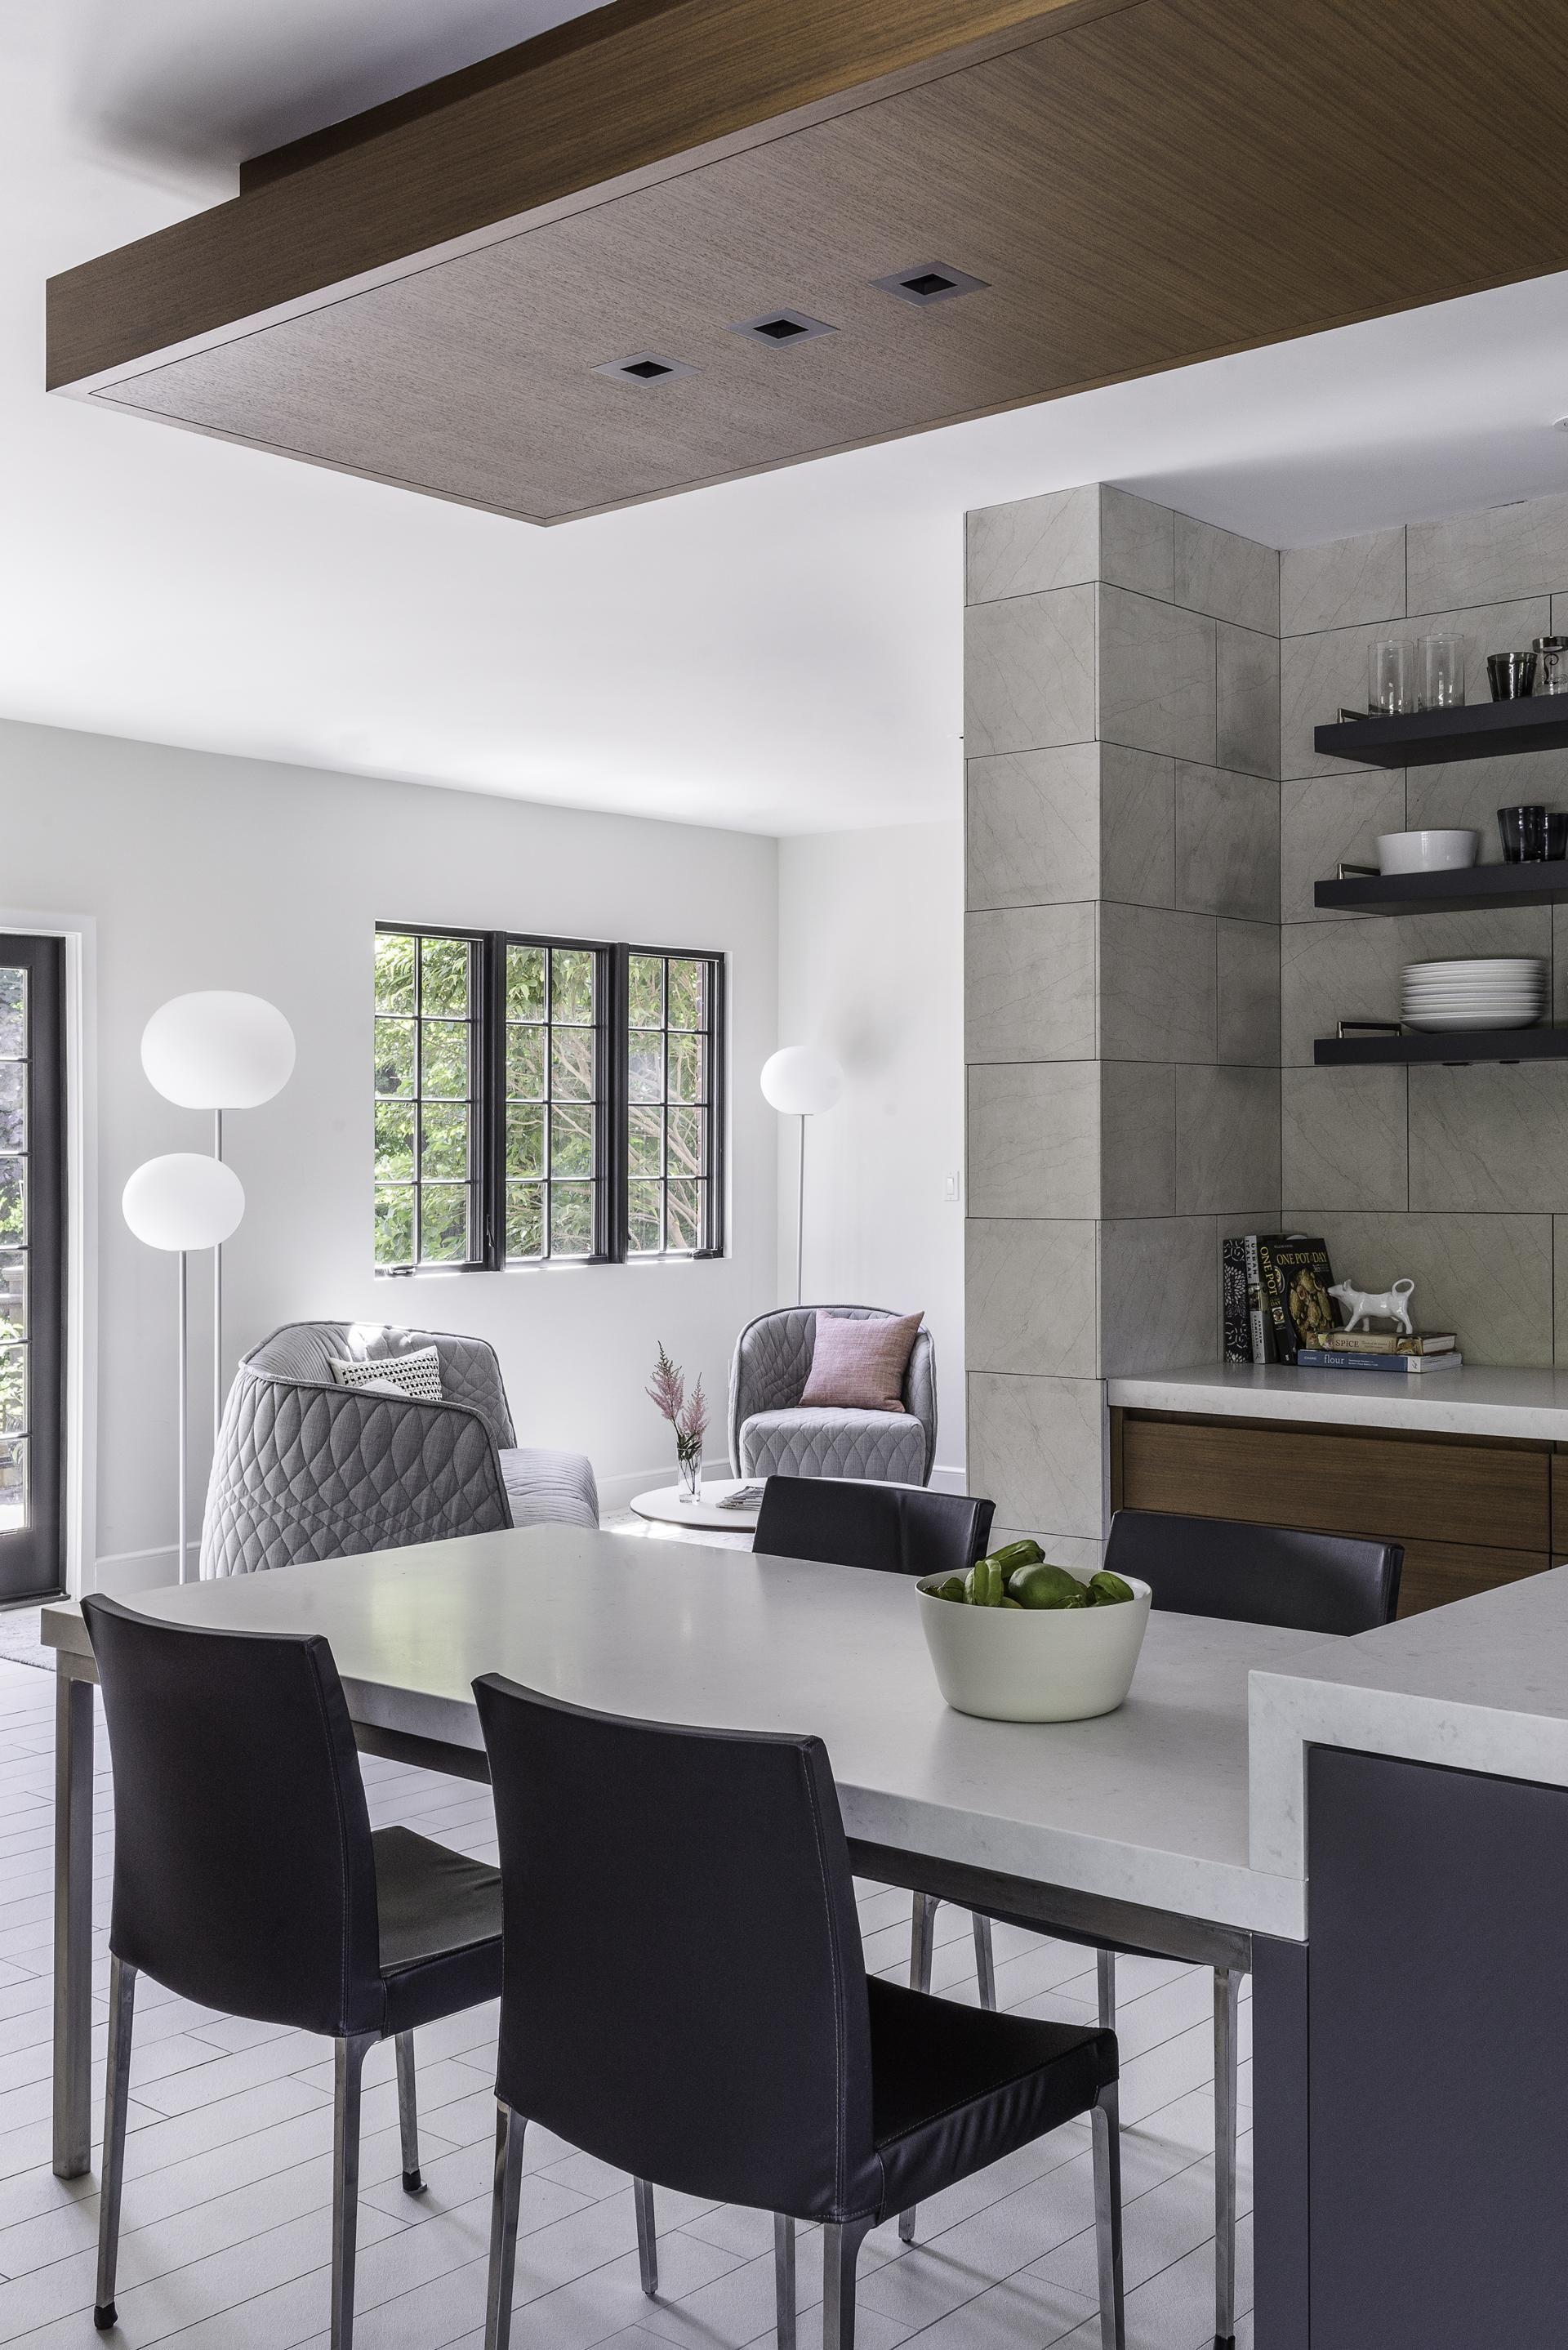 Bringing Urban Style To A Newton Home  Kitchens Apartment Living Amusing Kitchen Design Massachusetts Decorating Inspiration